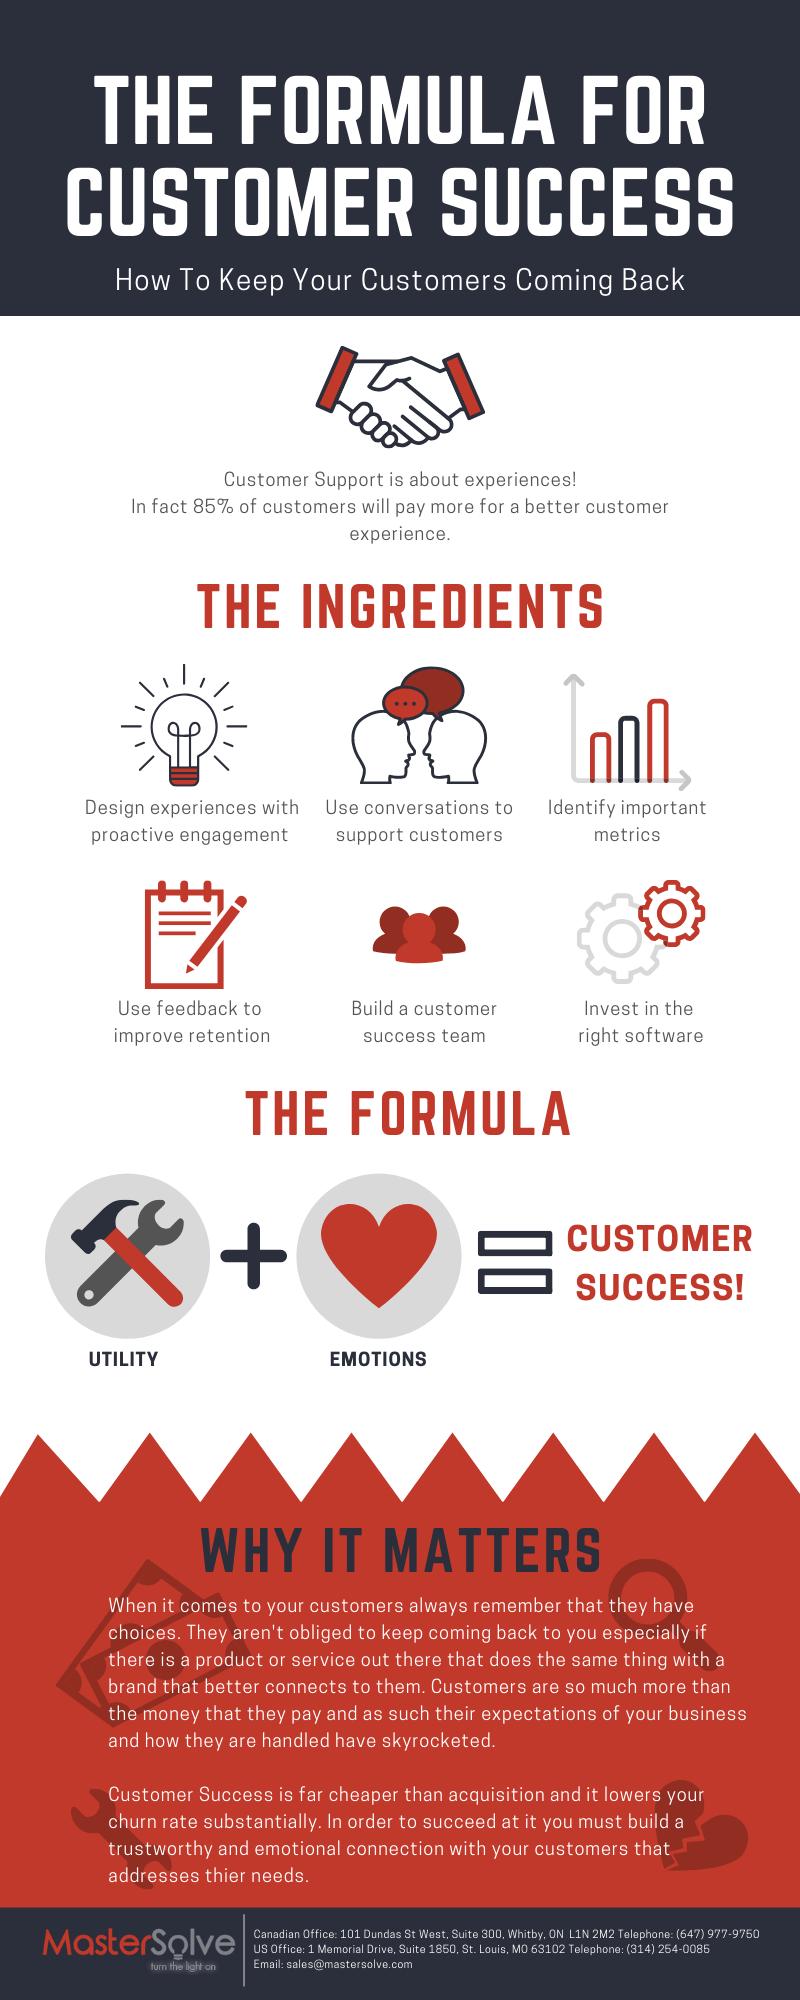 The Formula for Customer Success